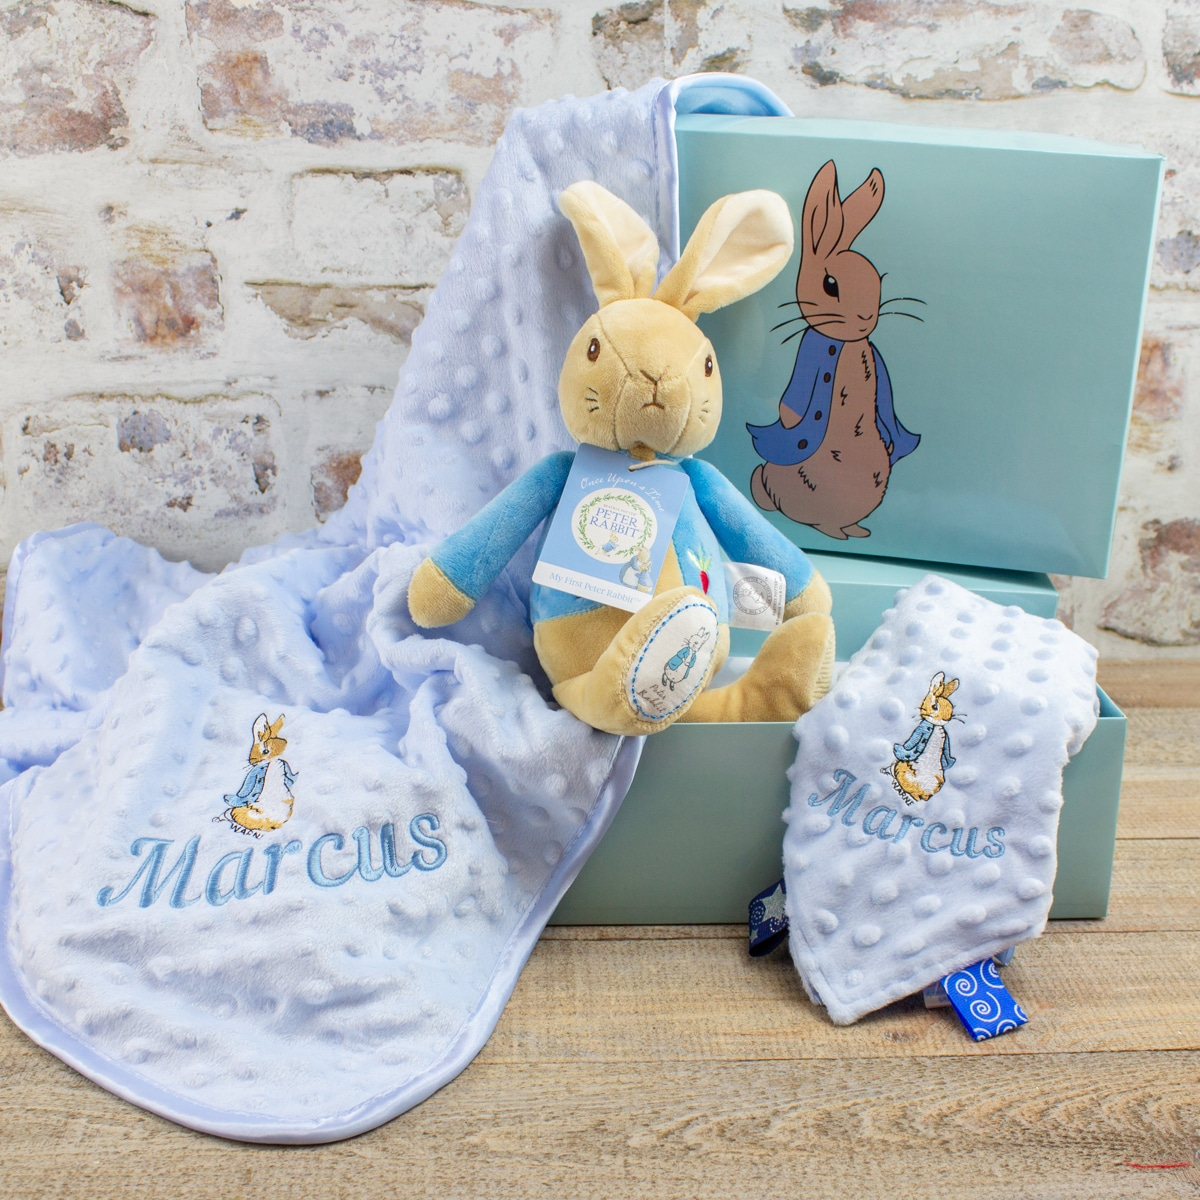 Personalised Peter Rabbit Baby Gift Hamper